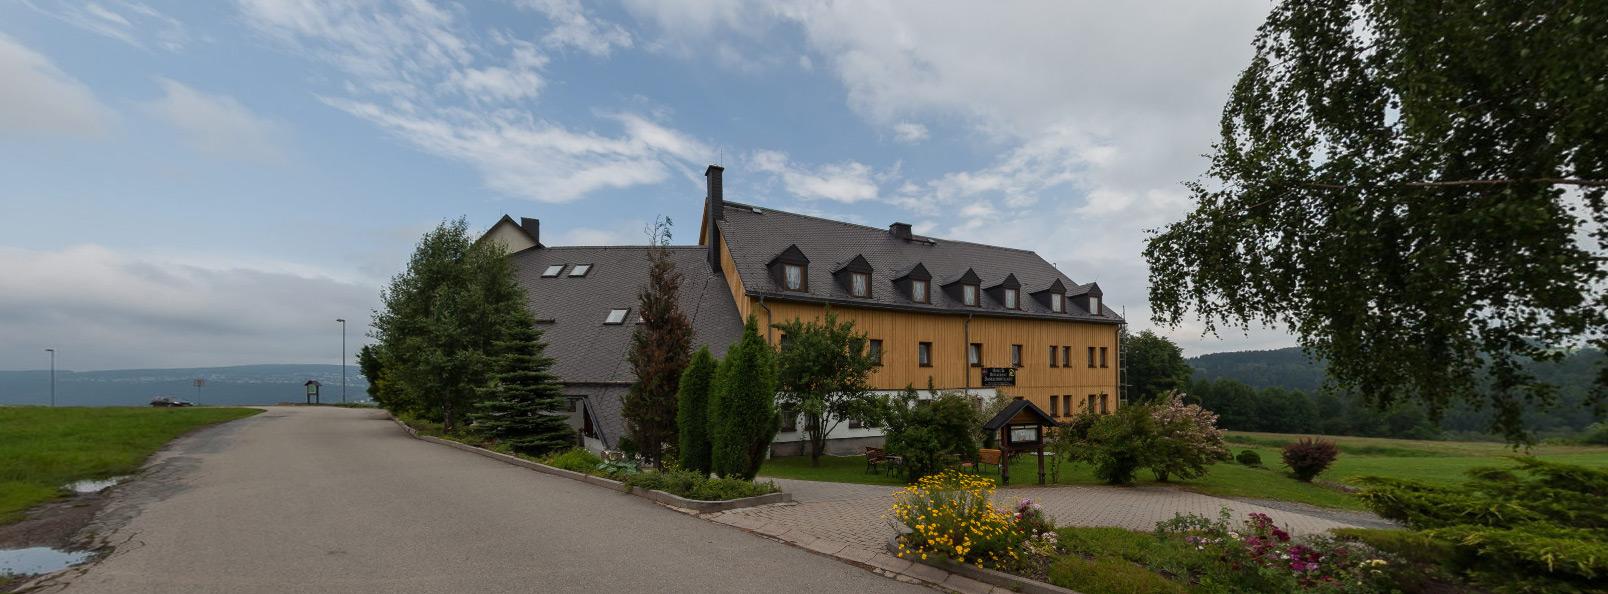 Danelchristelgut in Lauter Sachsen 5